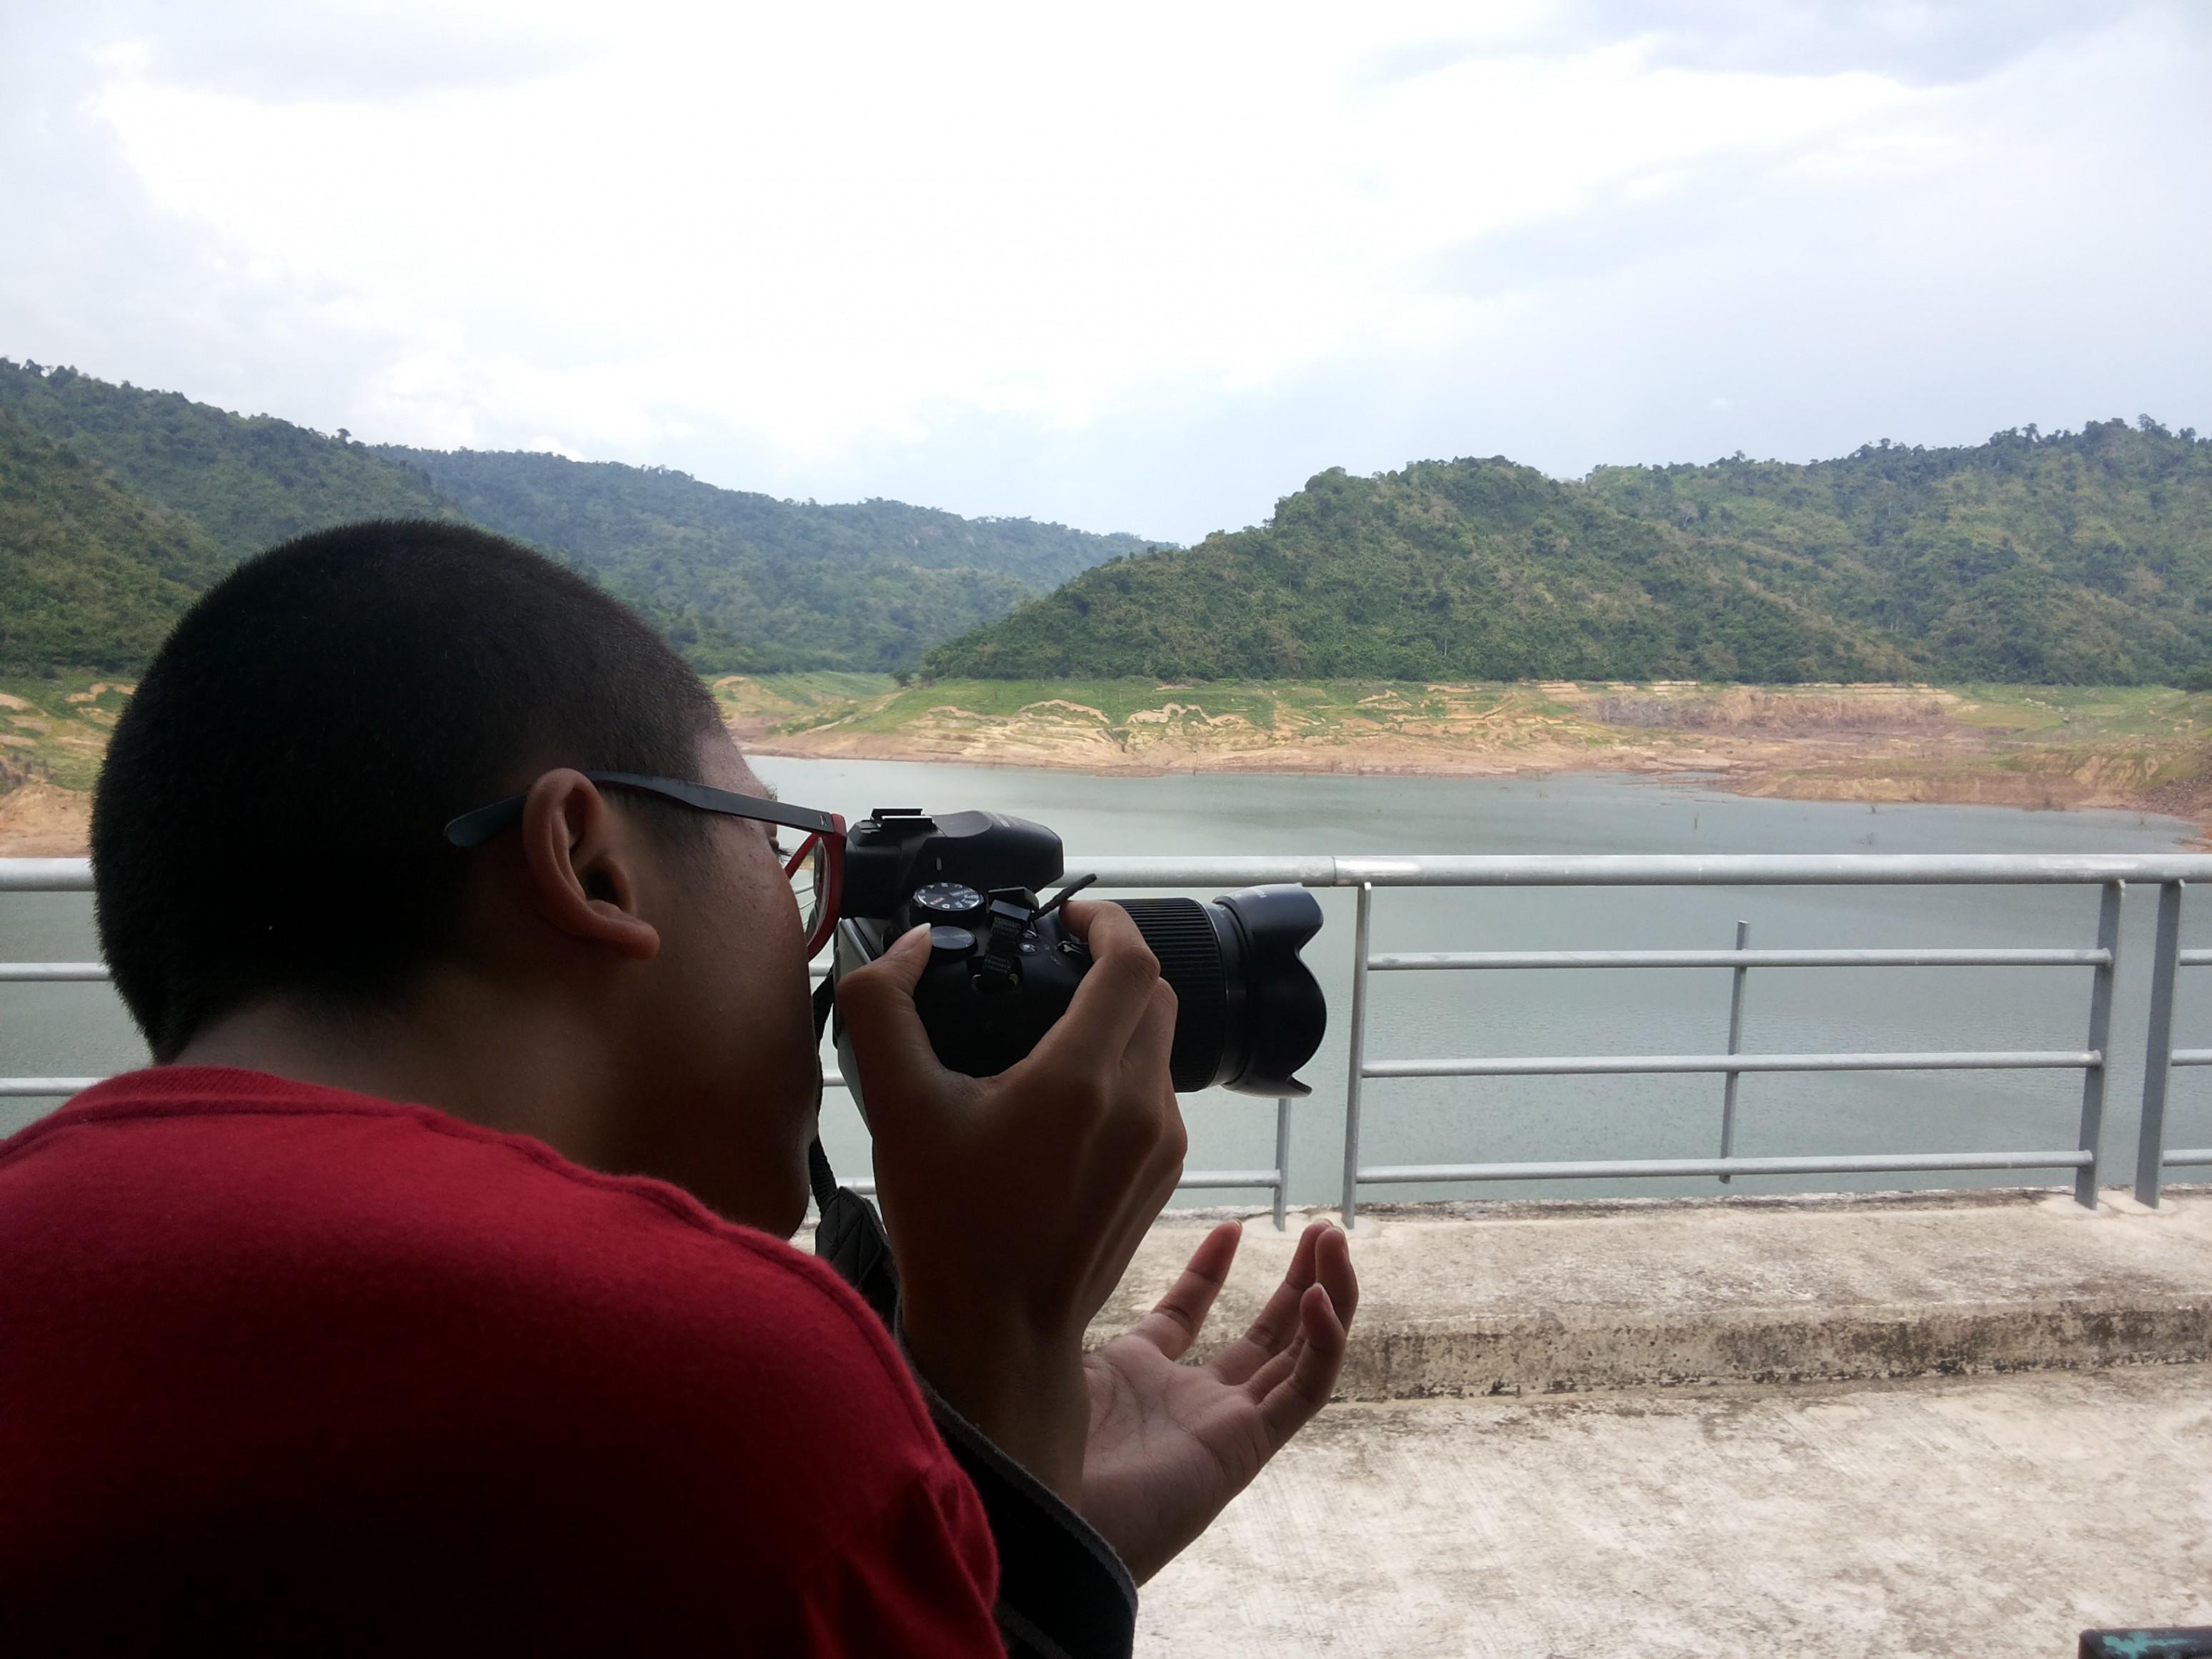 Takes Photographs